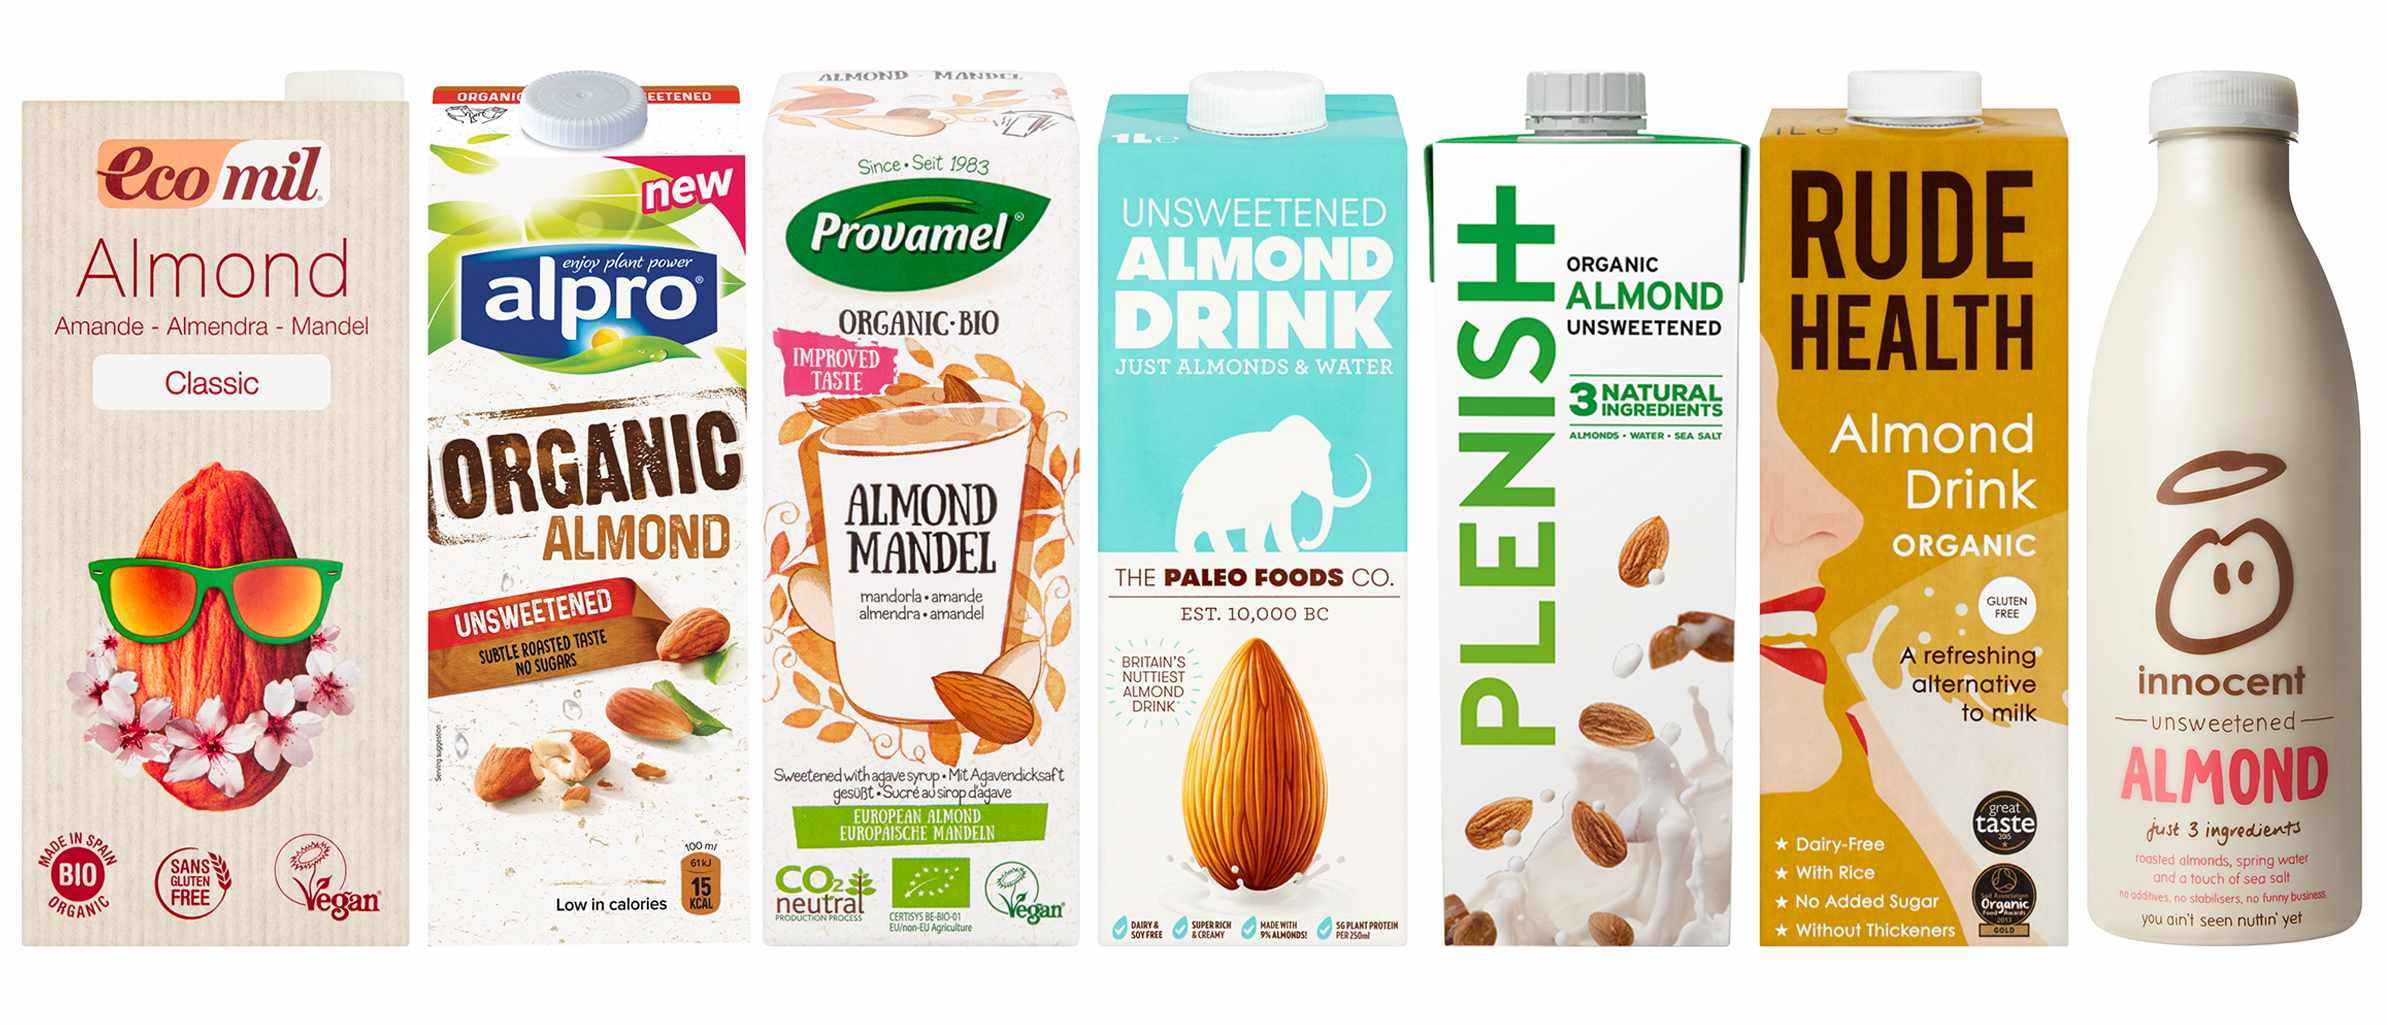 Almond milk taste test header image